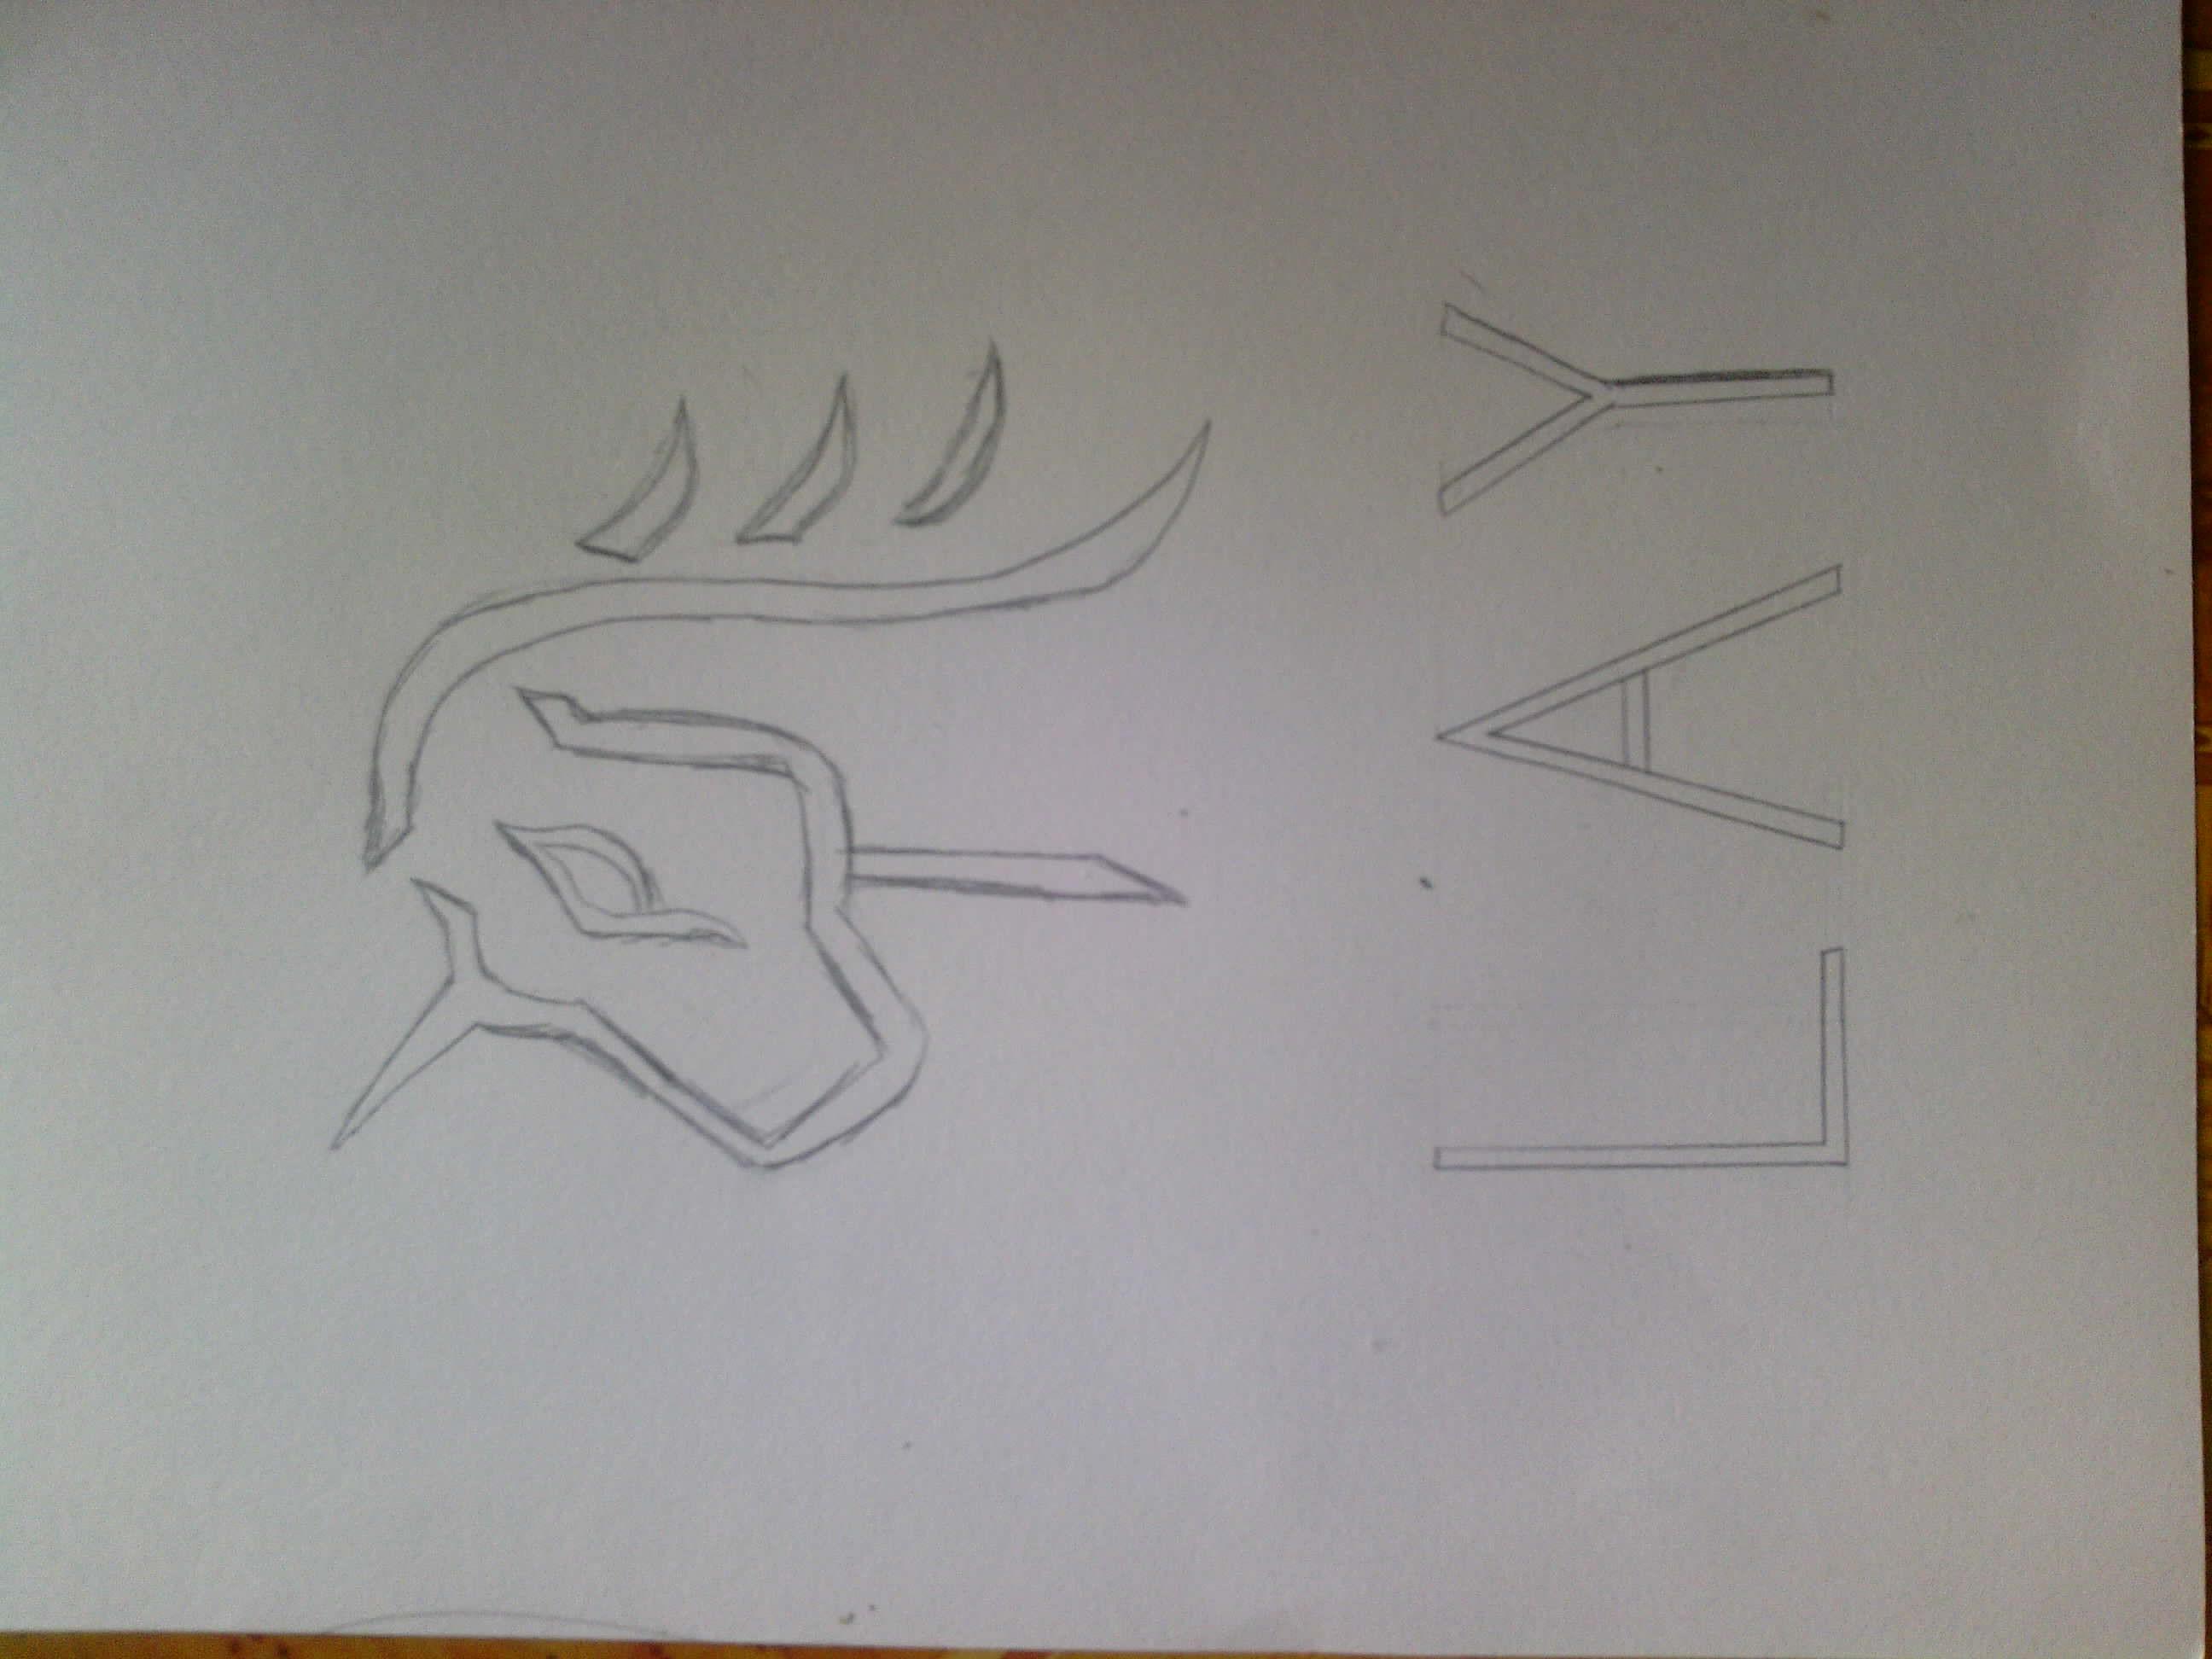 〈exoplanet° exo成员logo手绘图